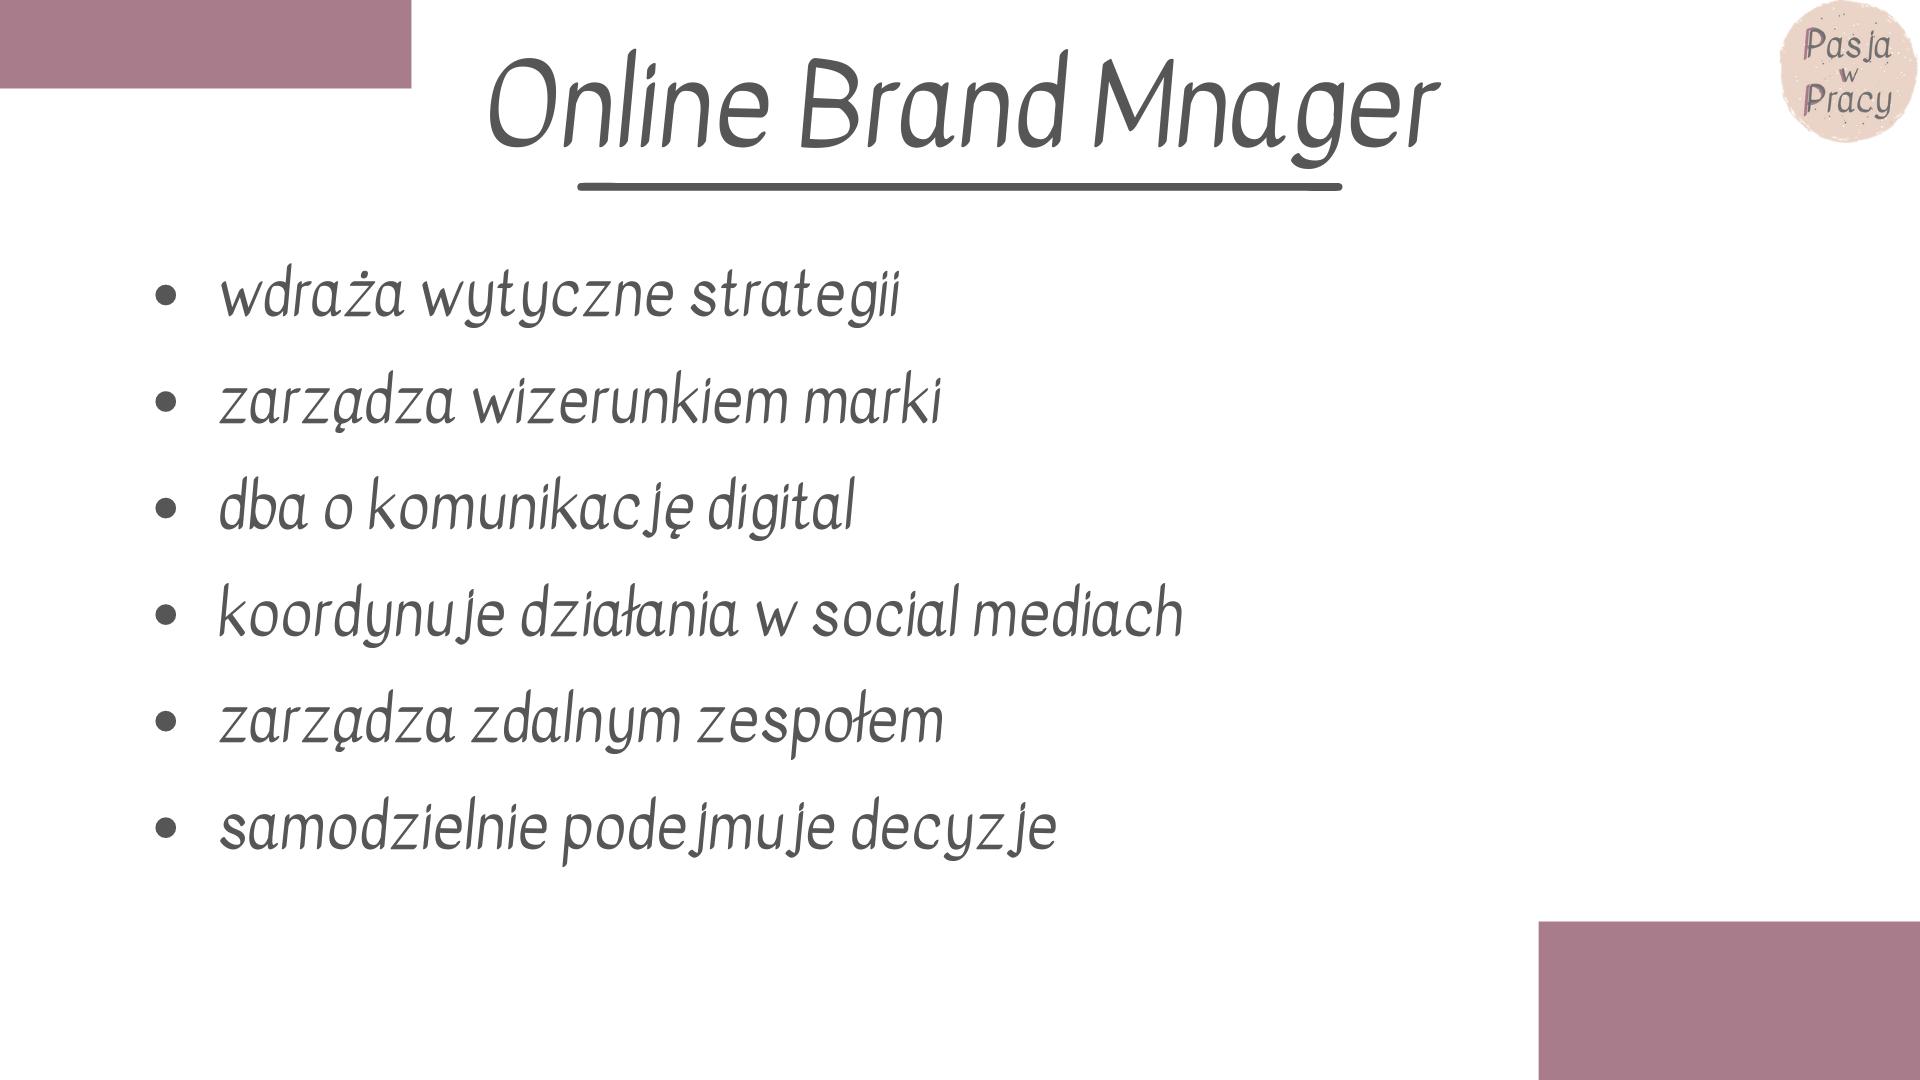 kim jest online brand manager - Kim jest Online Brand Manager